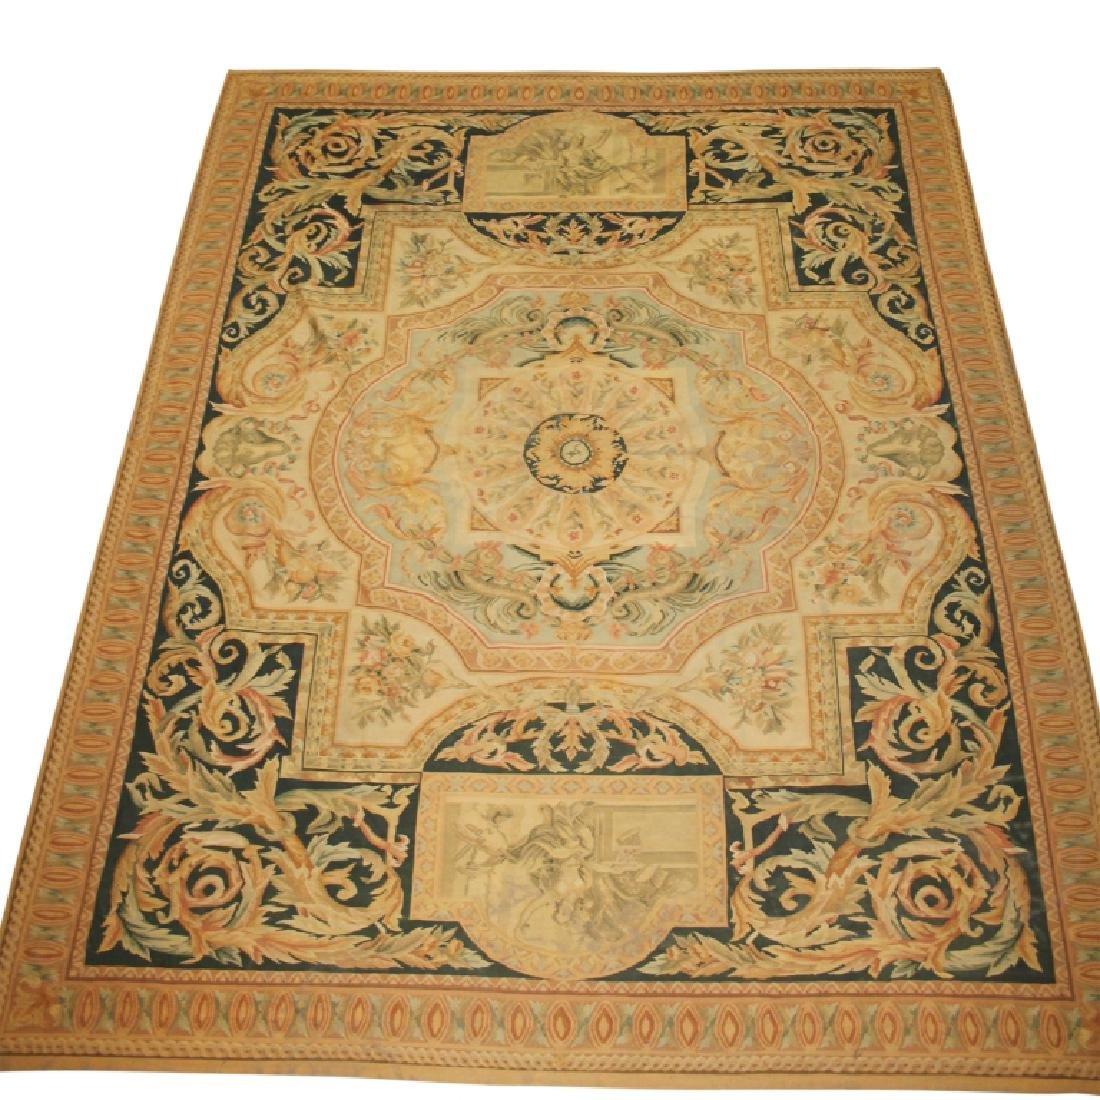 Needlepoint Carpet